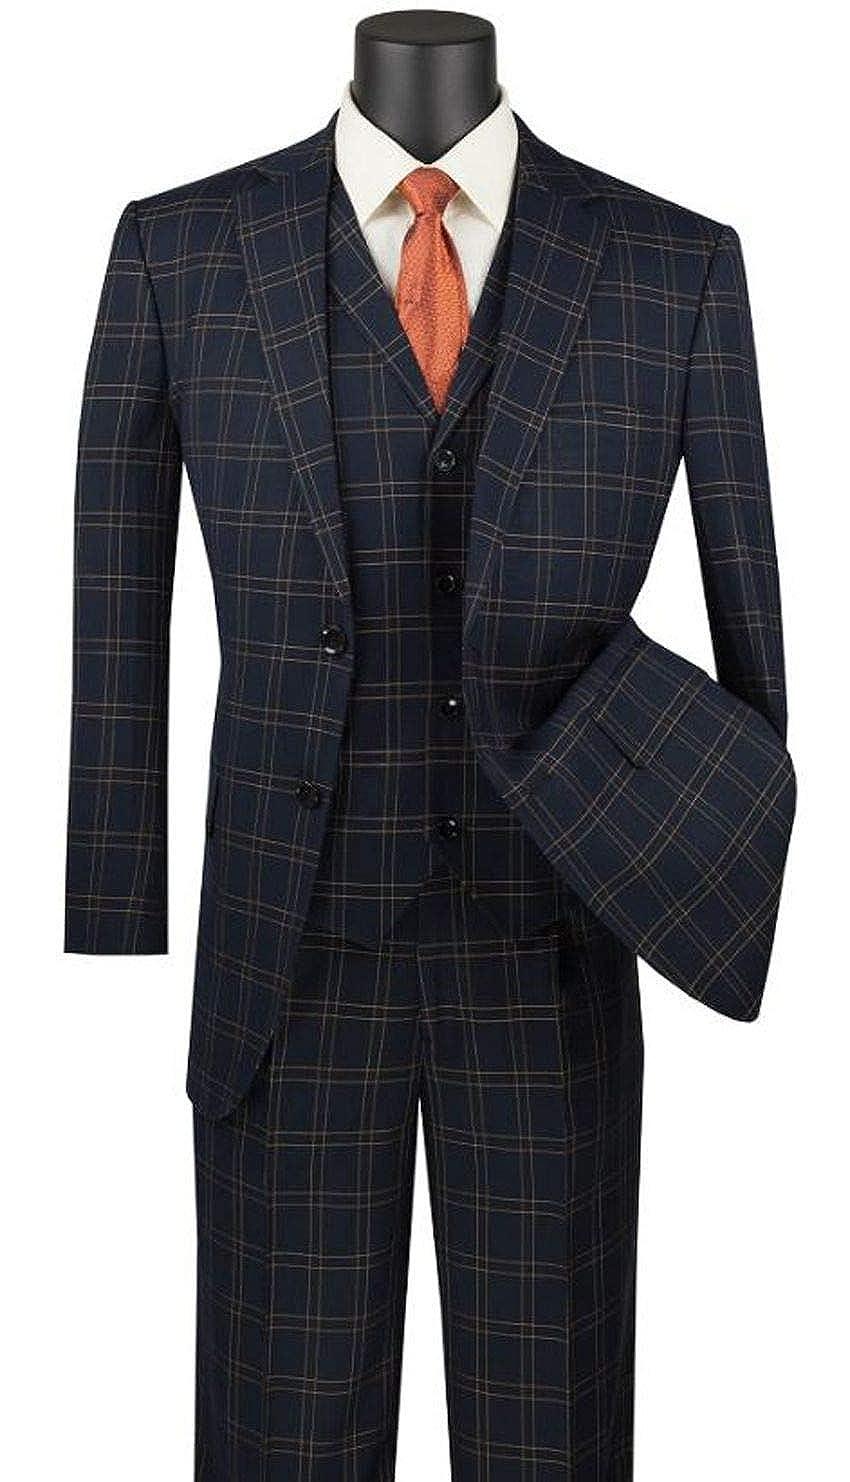 1930s Men's Clothing VINCI Mens Glen Plaid Pattern 2 Button Single Breasted Classic Fit Suit W/Vest V2PD-1 $130.99 AT vintagedancer.com